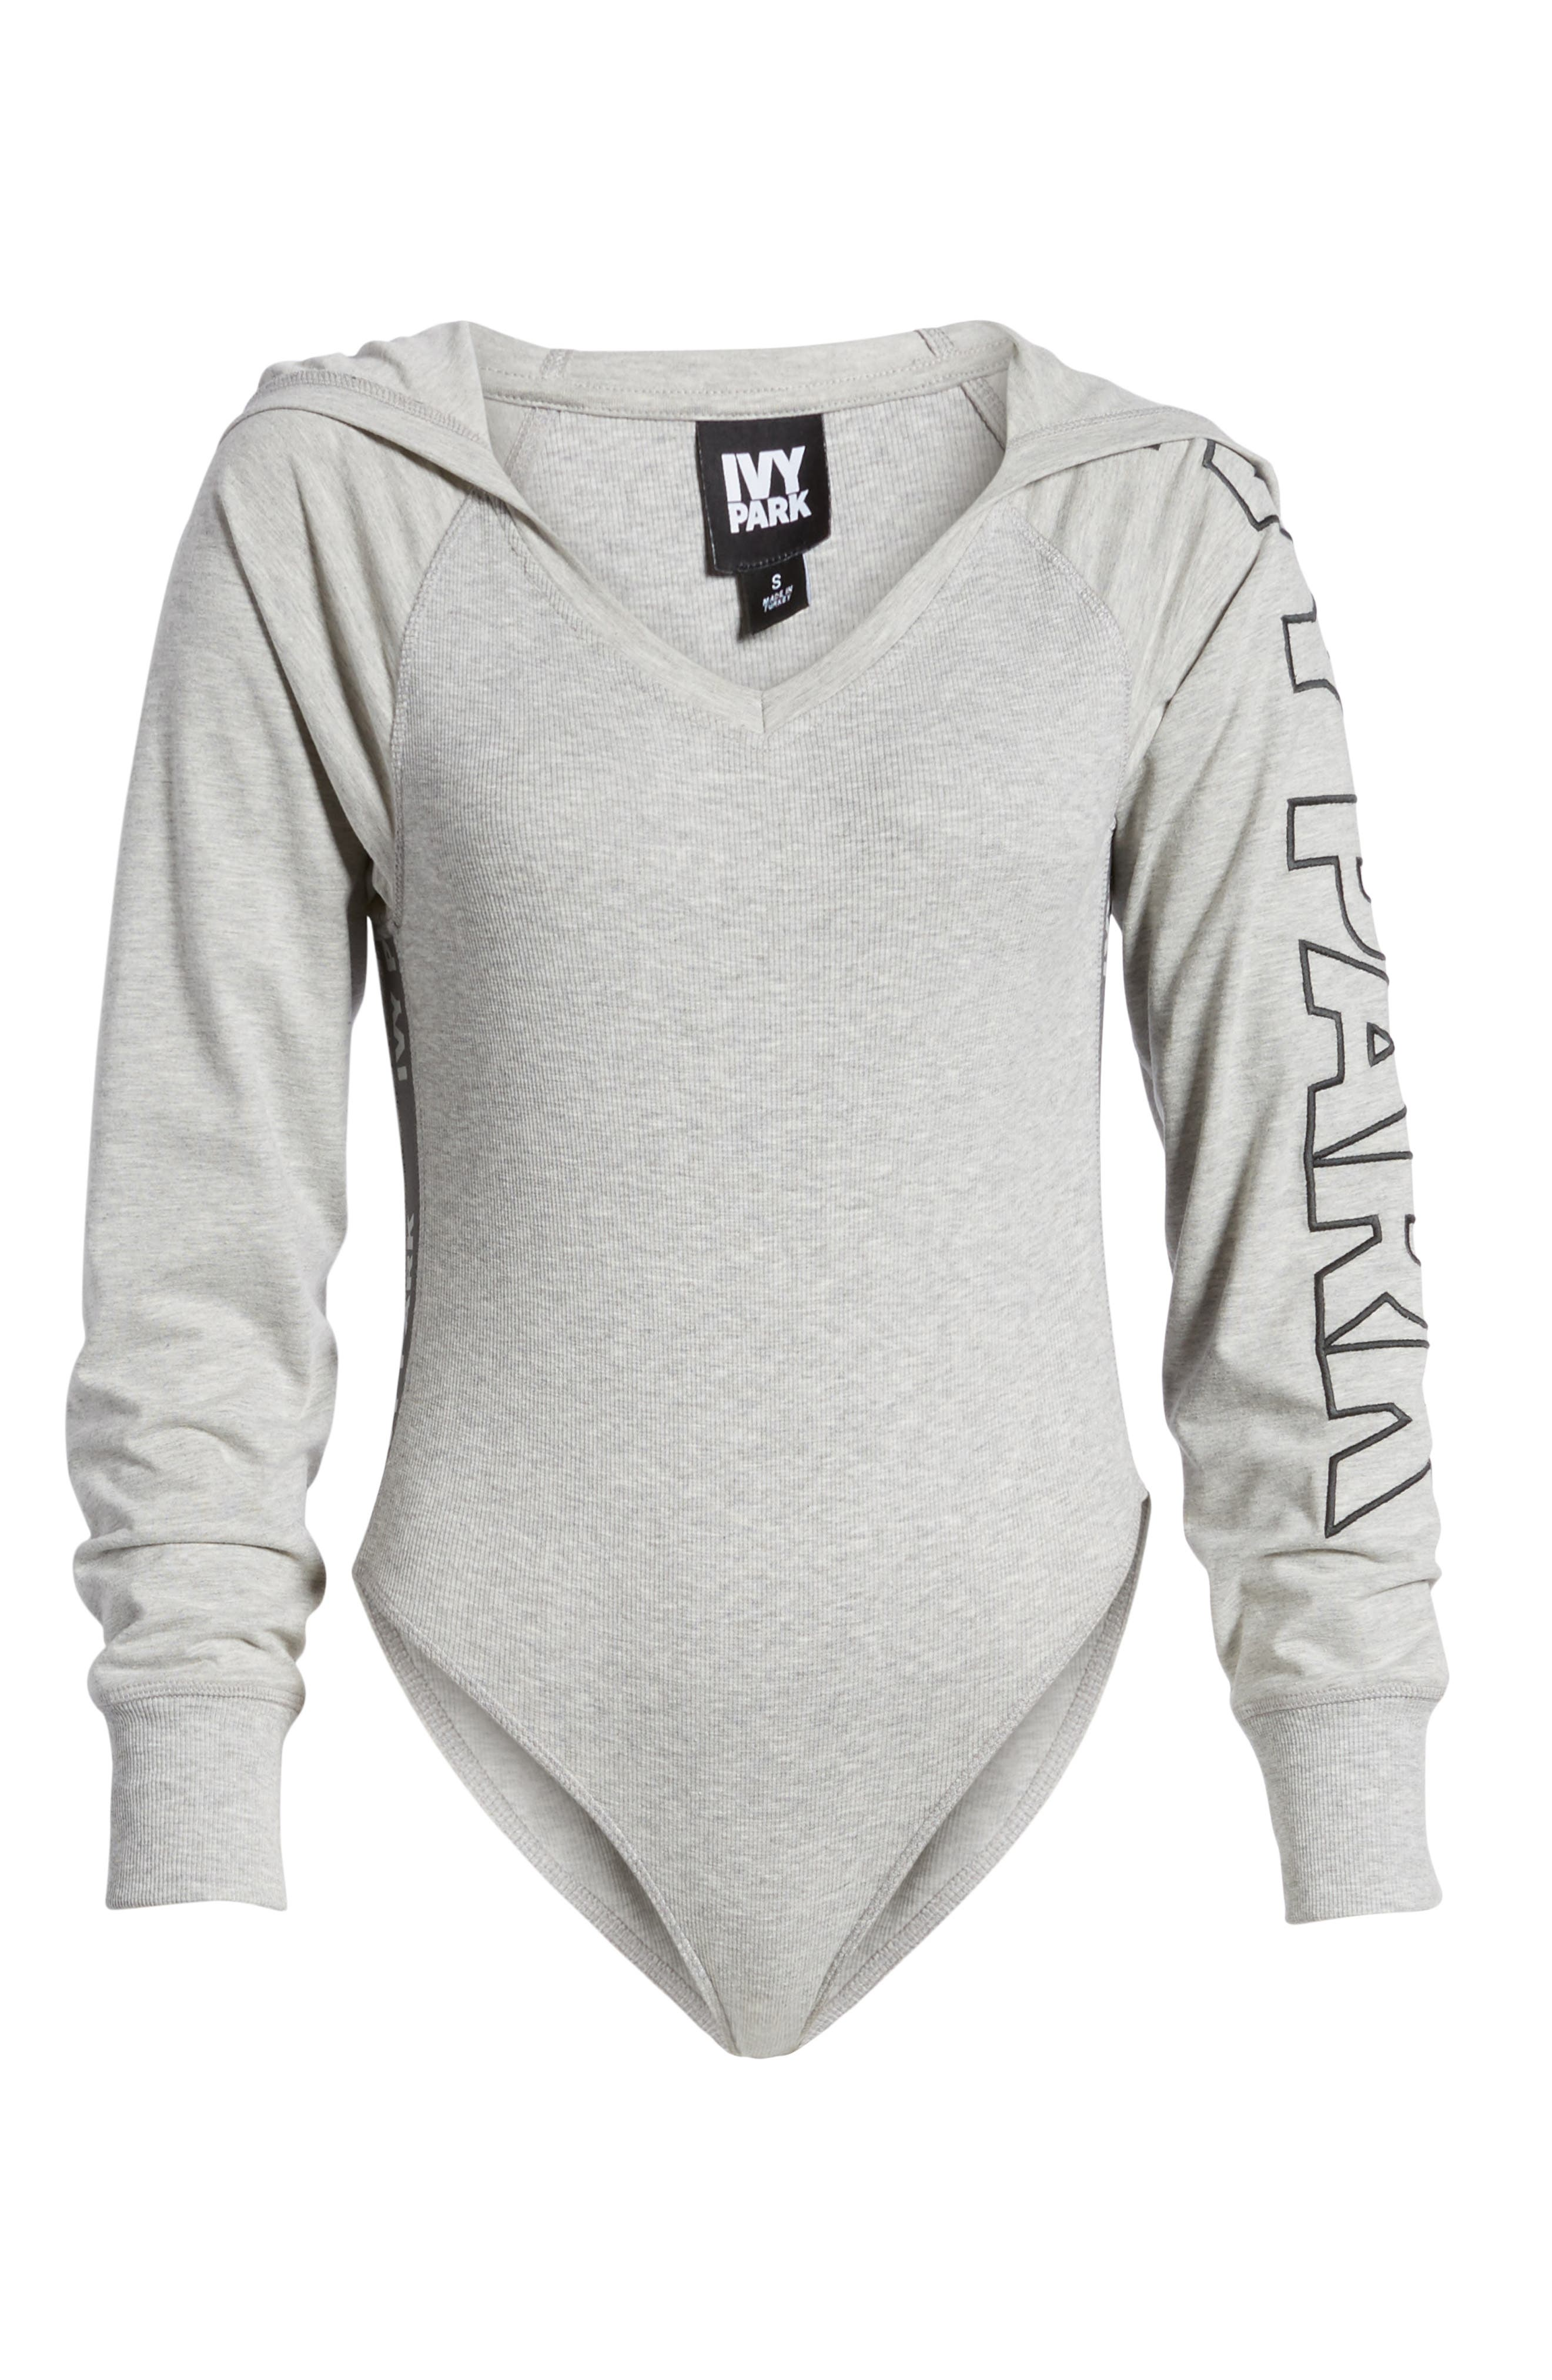 Main Image - IVY PARK® Hooded Bodysuit